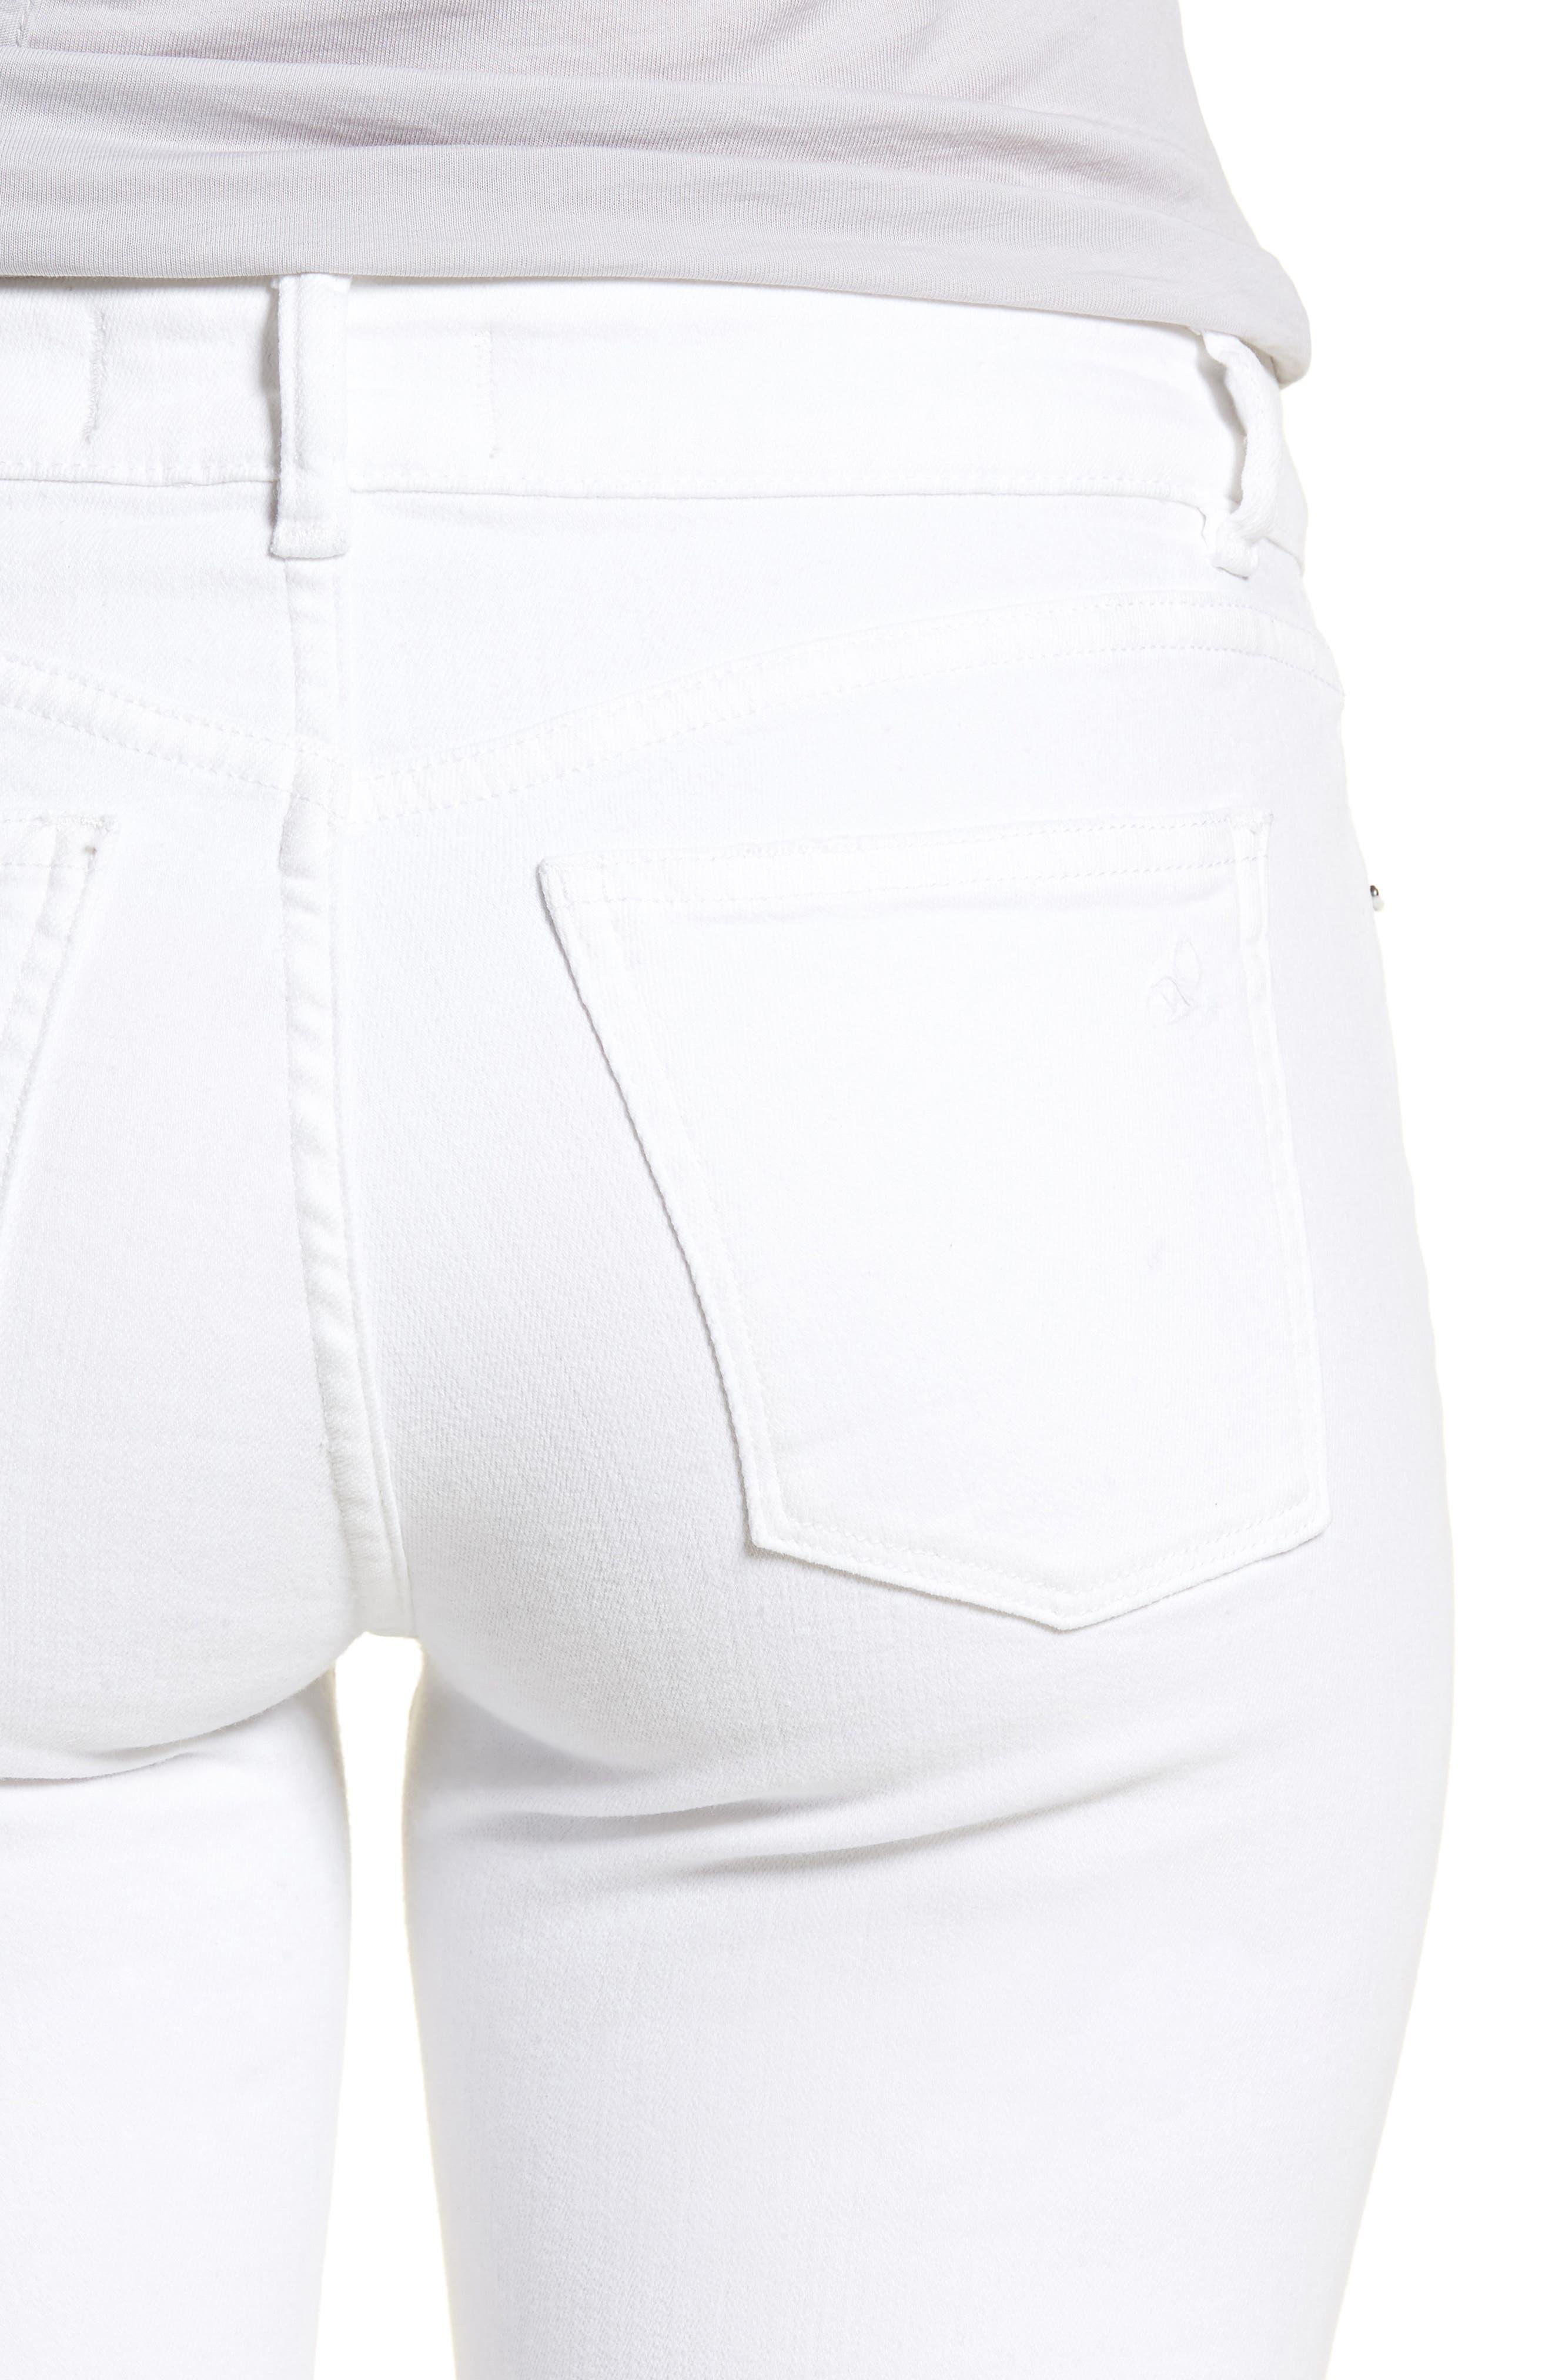 Emma Power Legging Jeans,                             Alternate thumbnail 4, color,                             Dawson